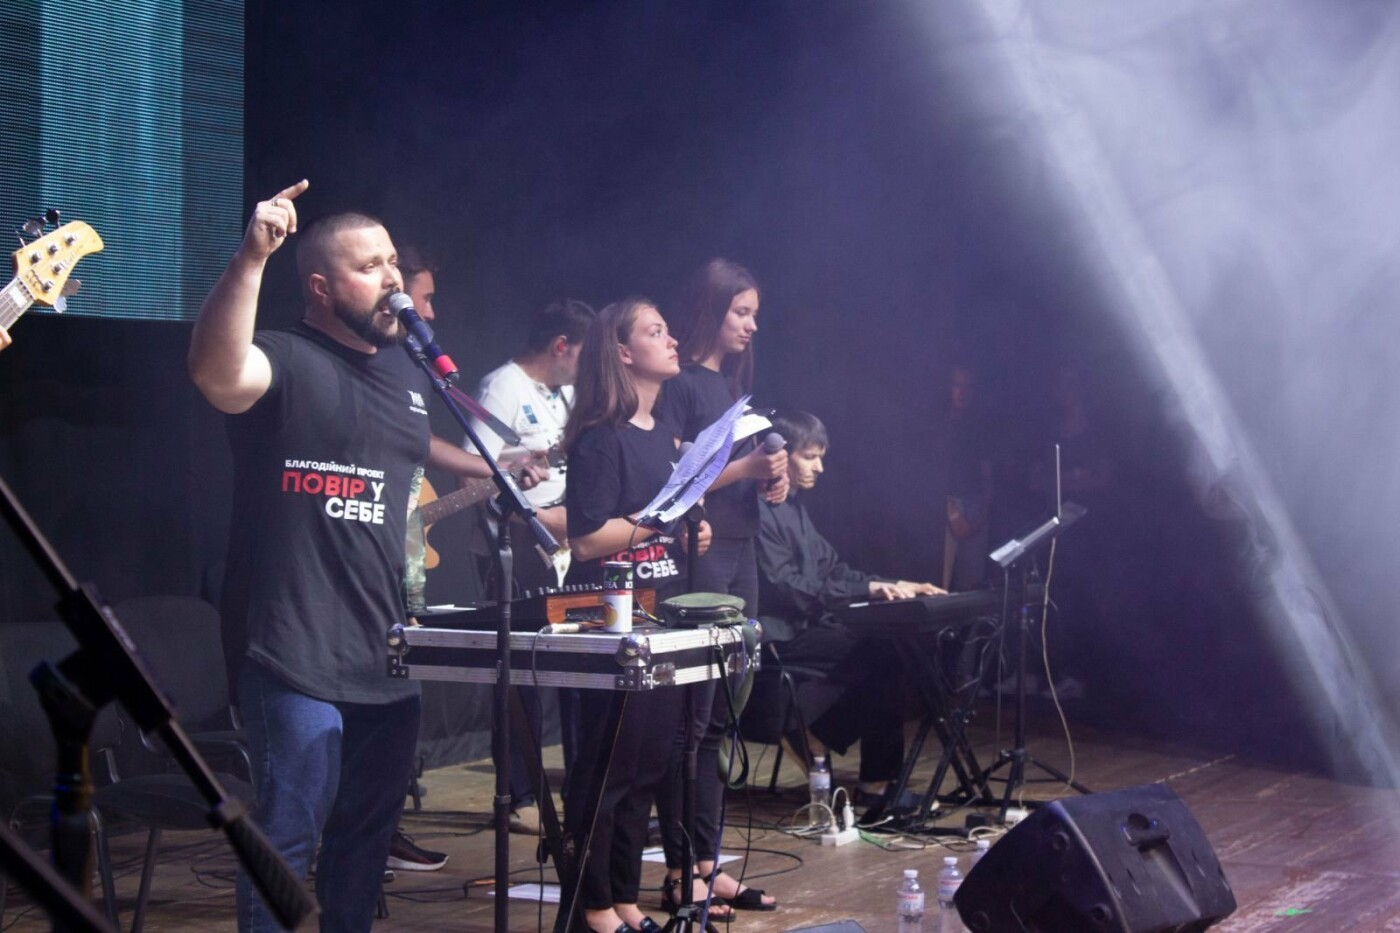 «Поверь в себя»: в Бердянске посвятили концерт проблемам молодежи, фото-2